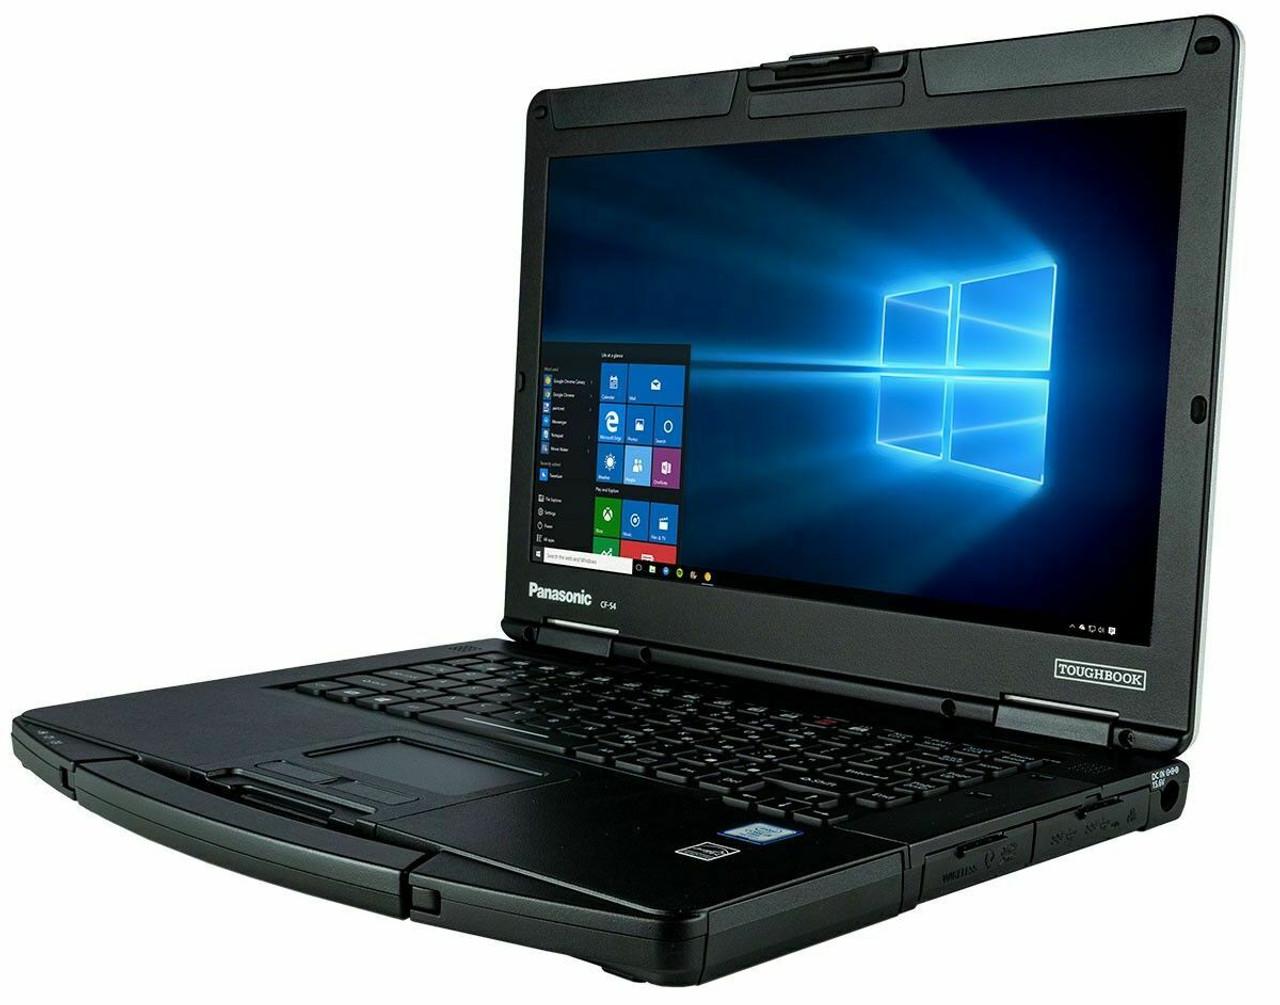 Panasonic Toughbook CF-54 i5-5300U